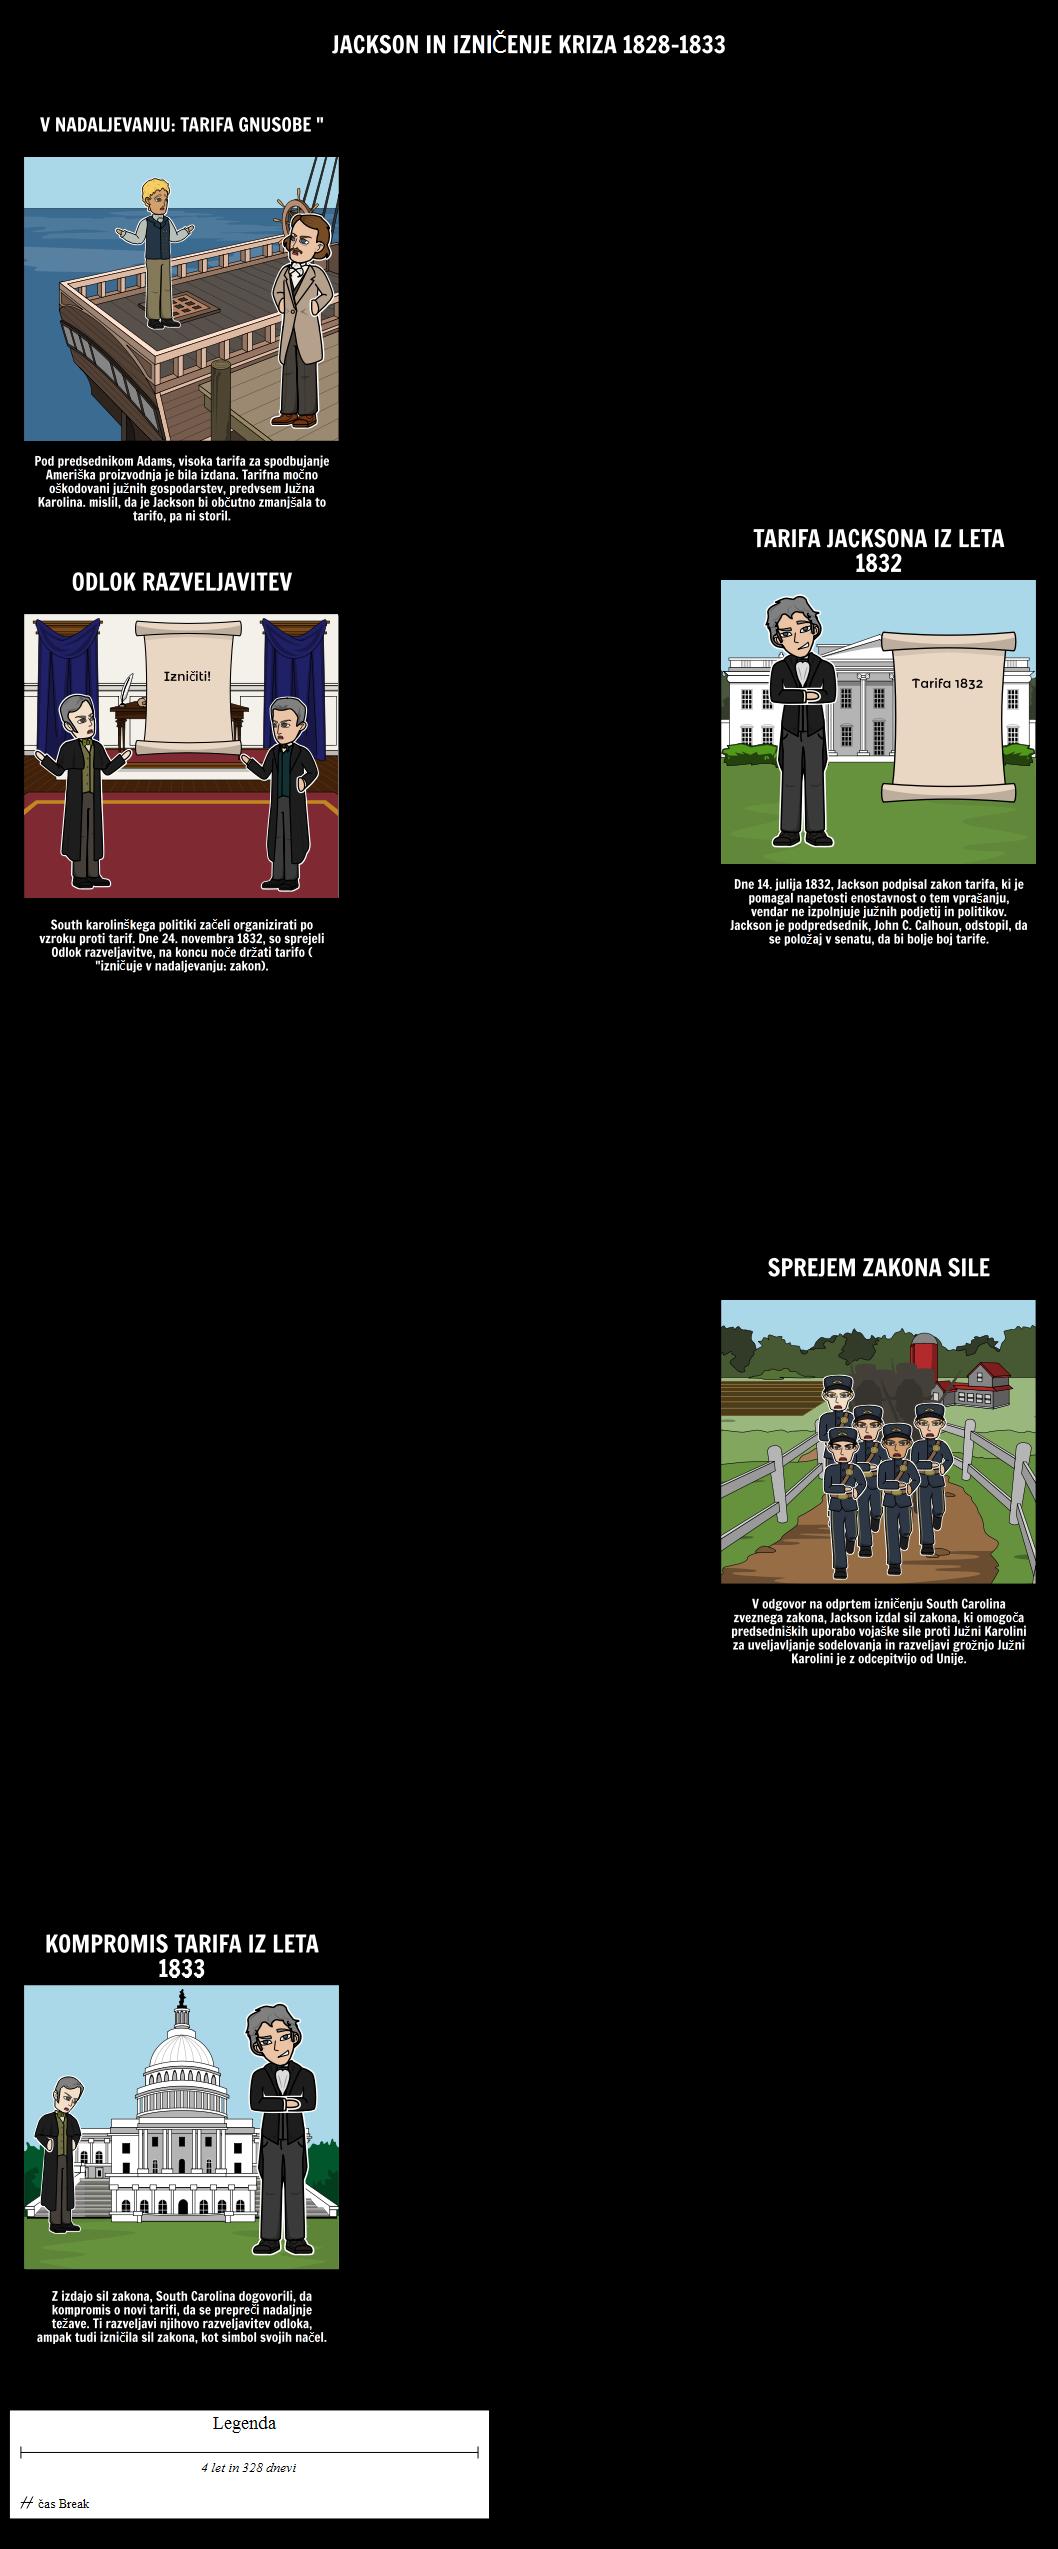 Jacksonian Demokracija - Jackson in tarifa Kriza 1828-1833